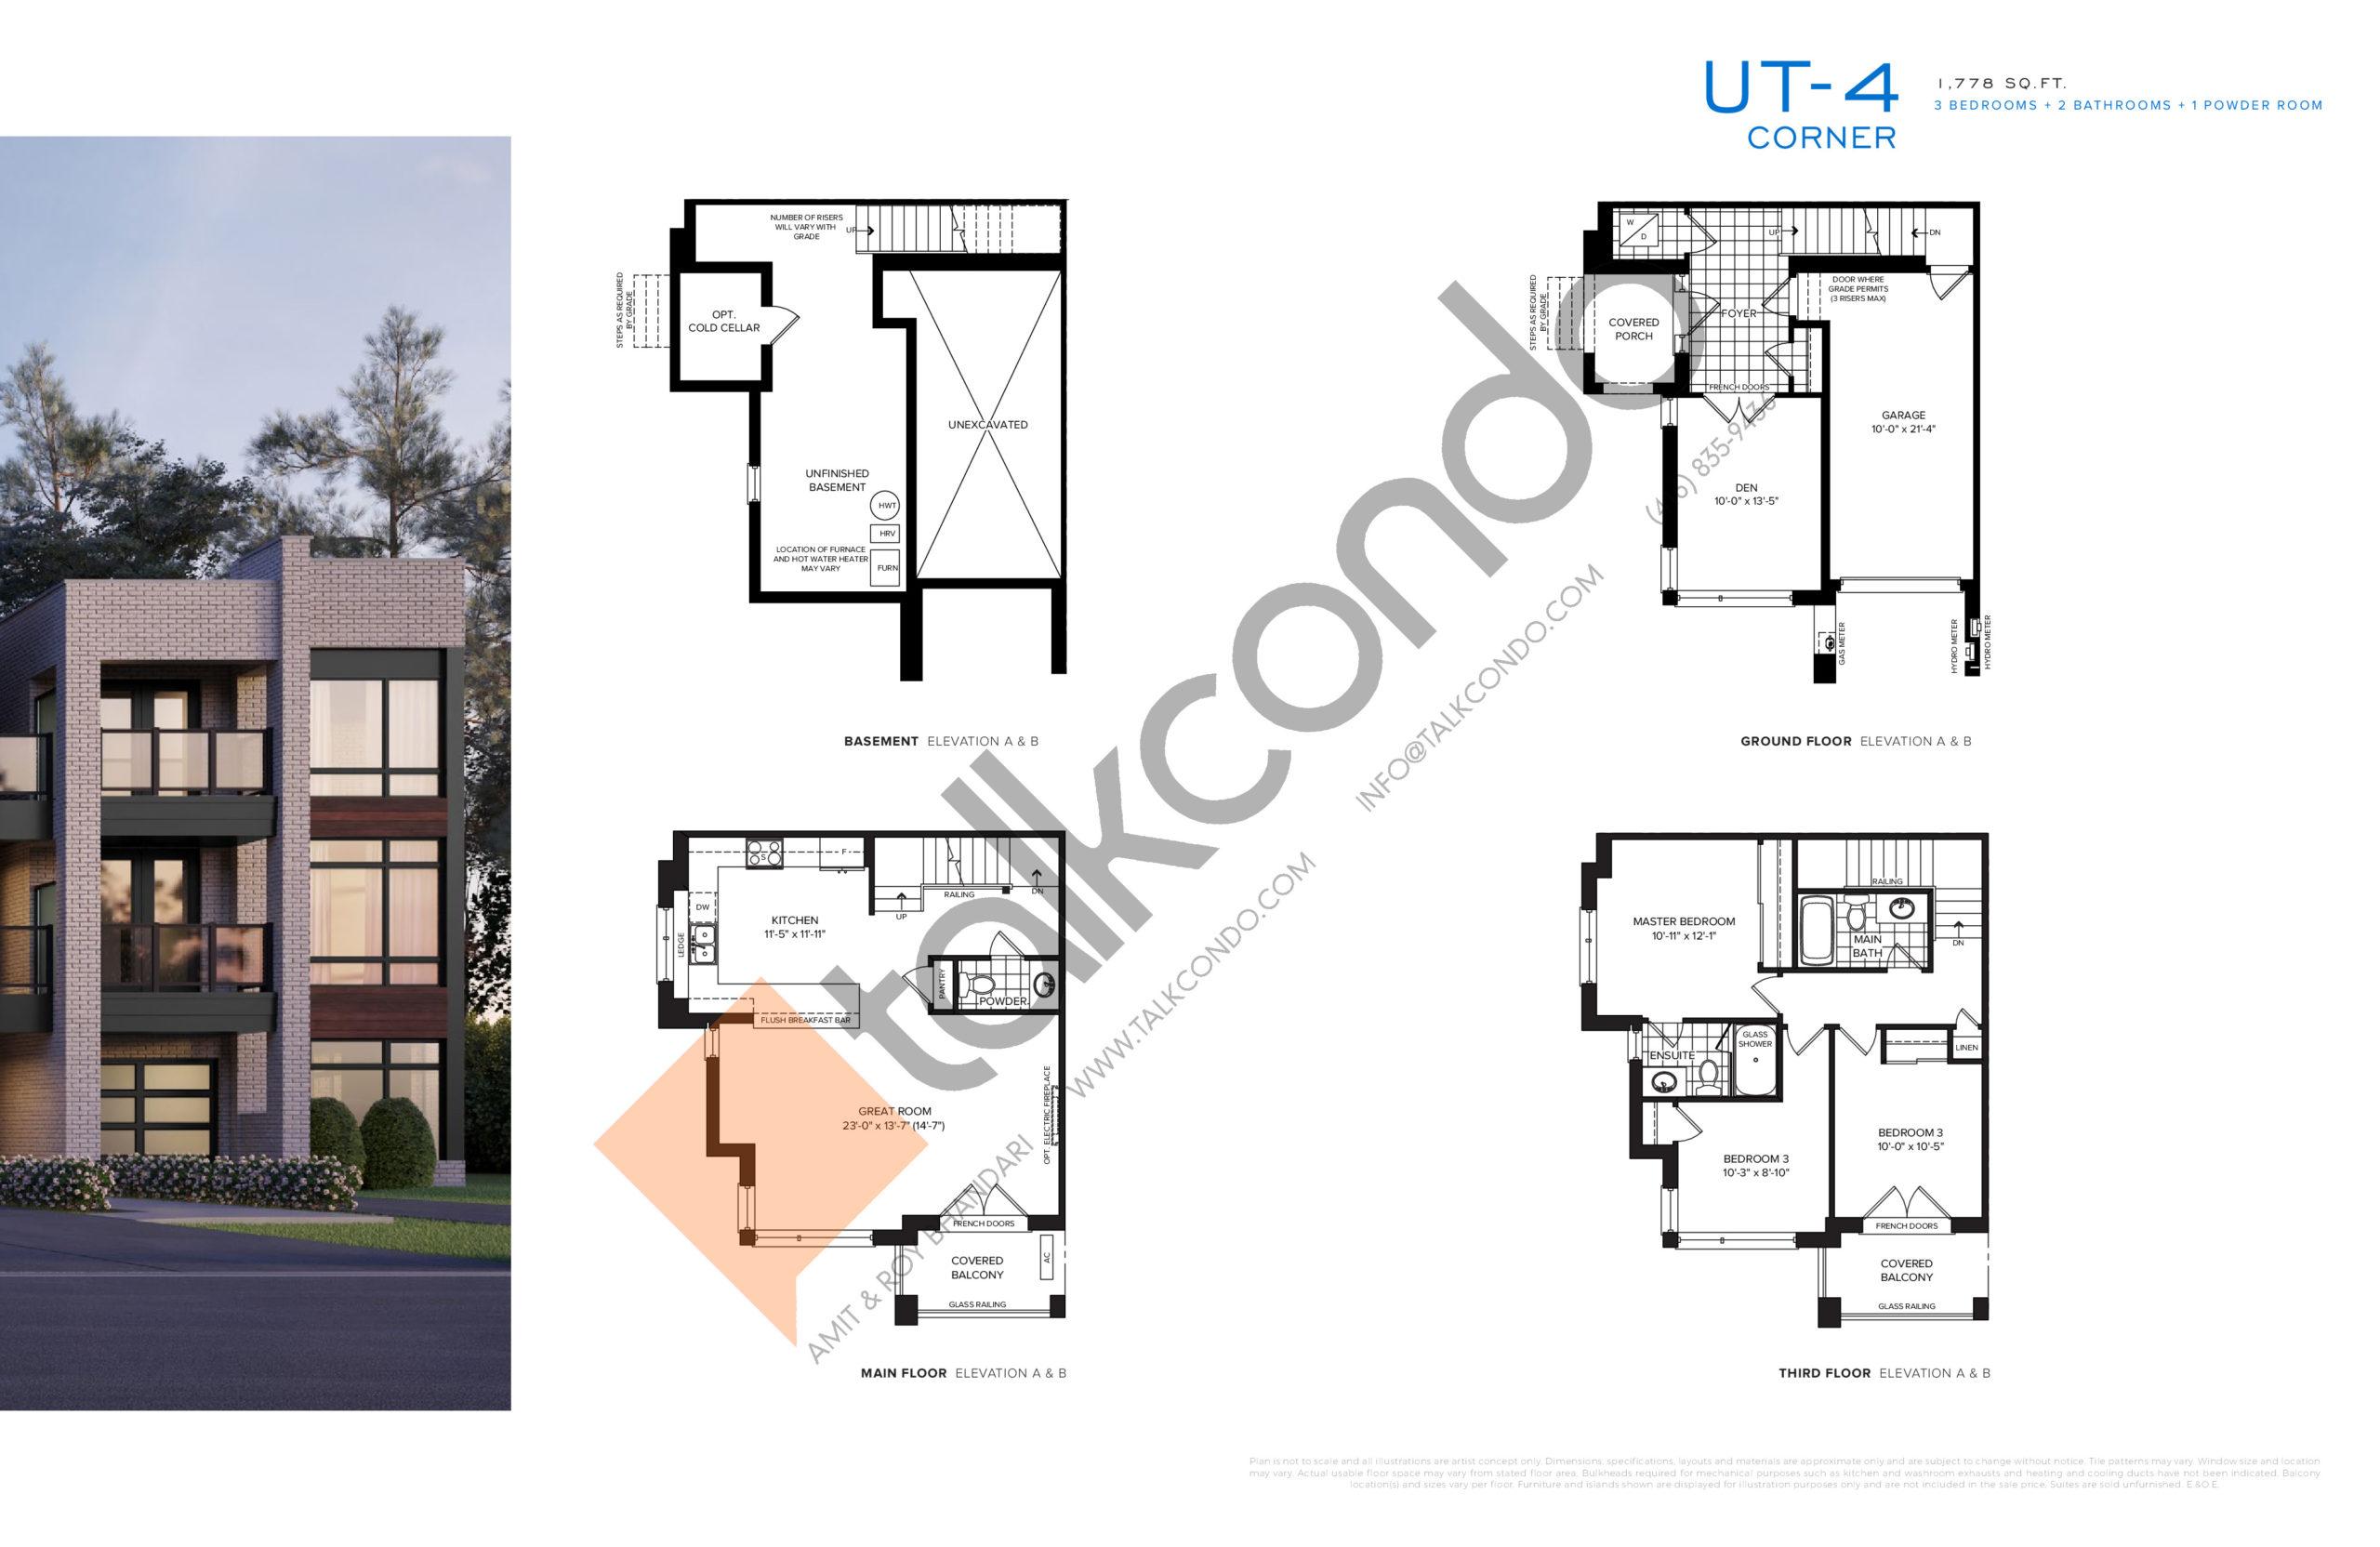 UT-4 Corner Floor Plan at SXSW Ravine Towns - 1778 sq.ft